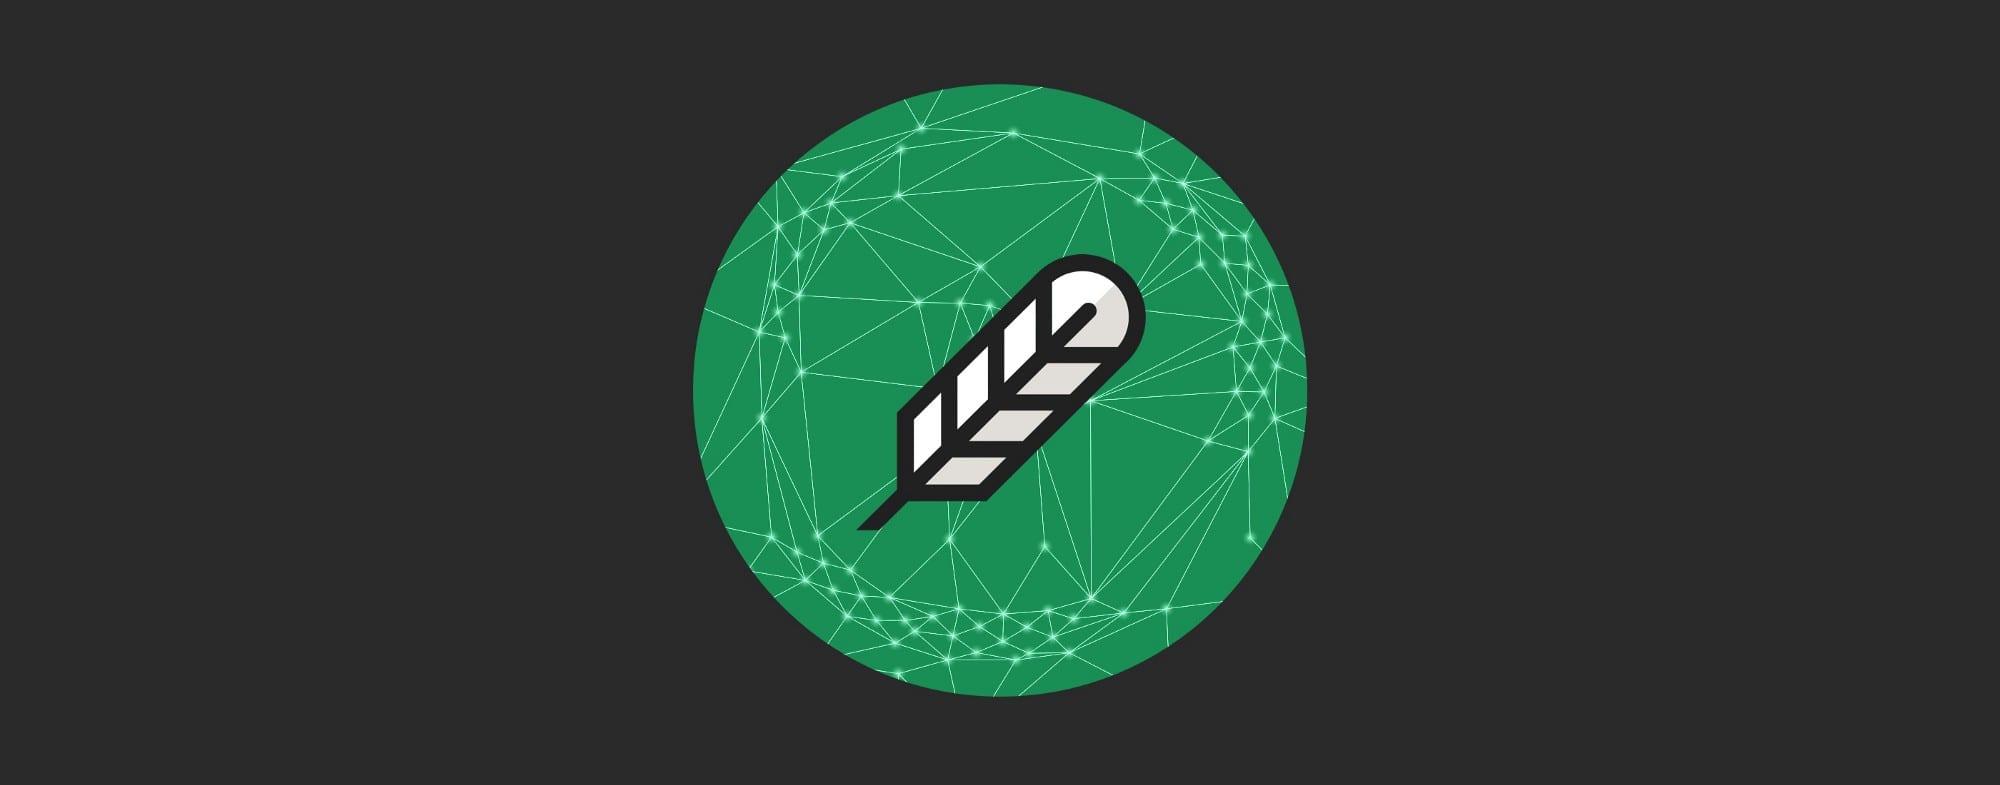 Blockchain Technology Penetrates Publishing – Po.et Amino Pay Kreds Blockchain 2 - Blockchain Technology Penetrates Publishing – Po.et, Amino Pay, Kreds Blockchain